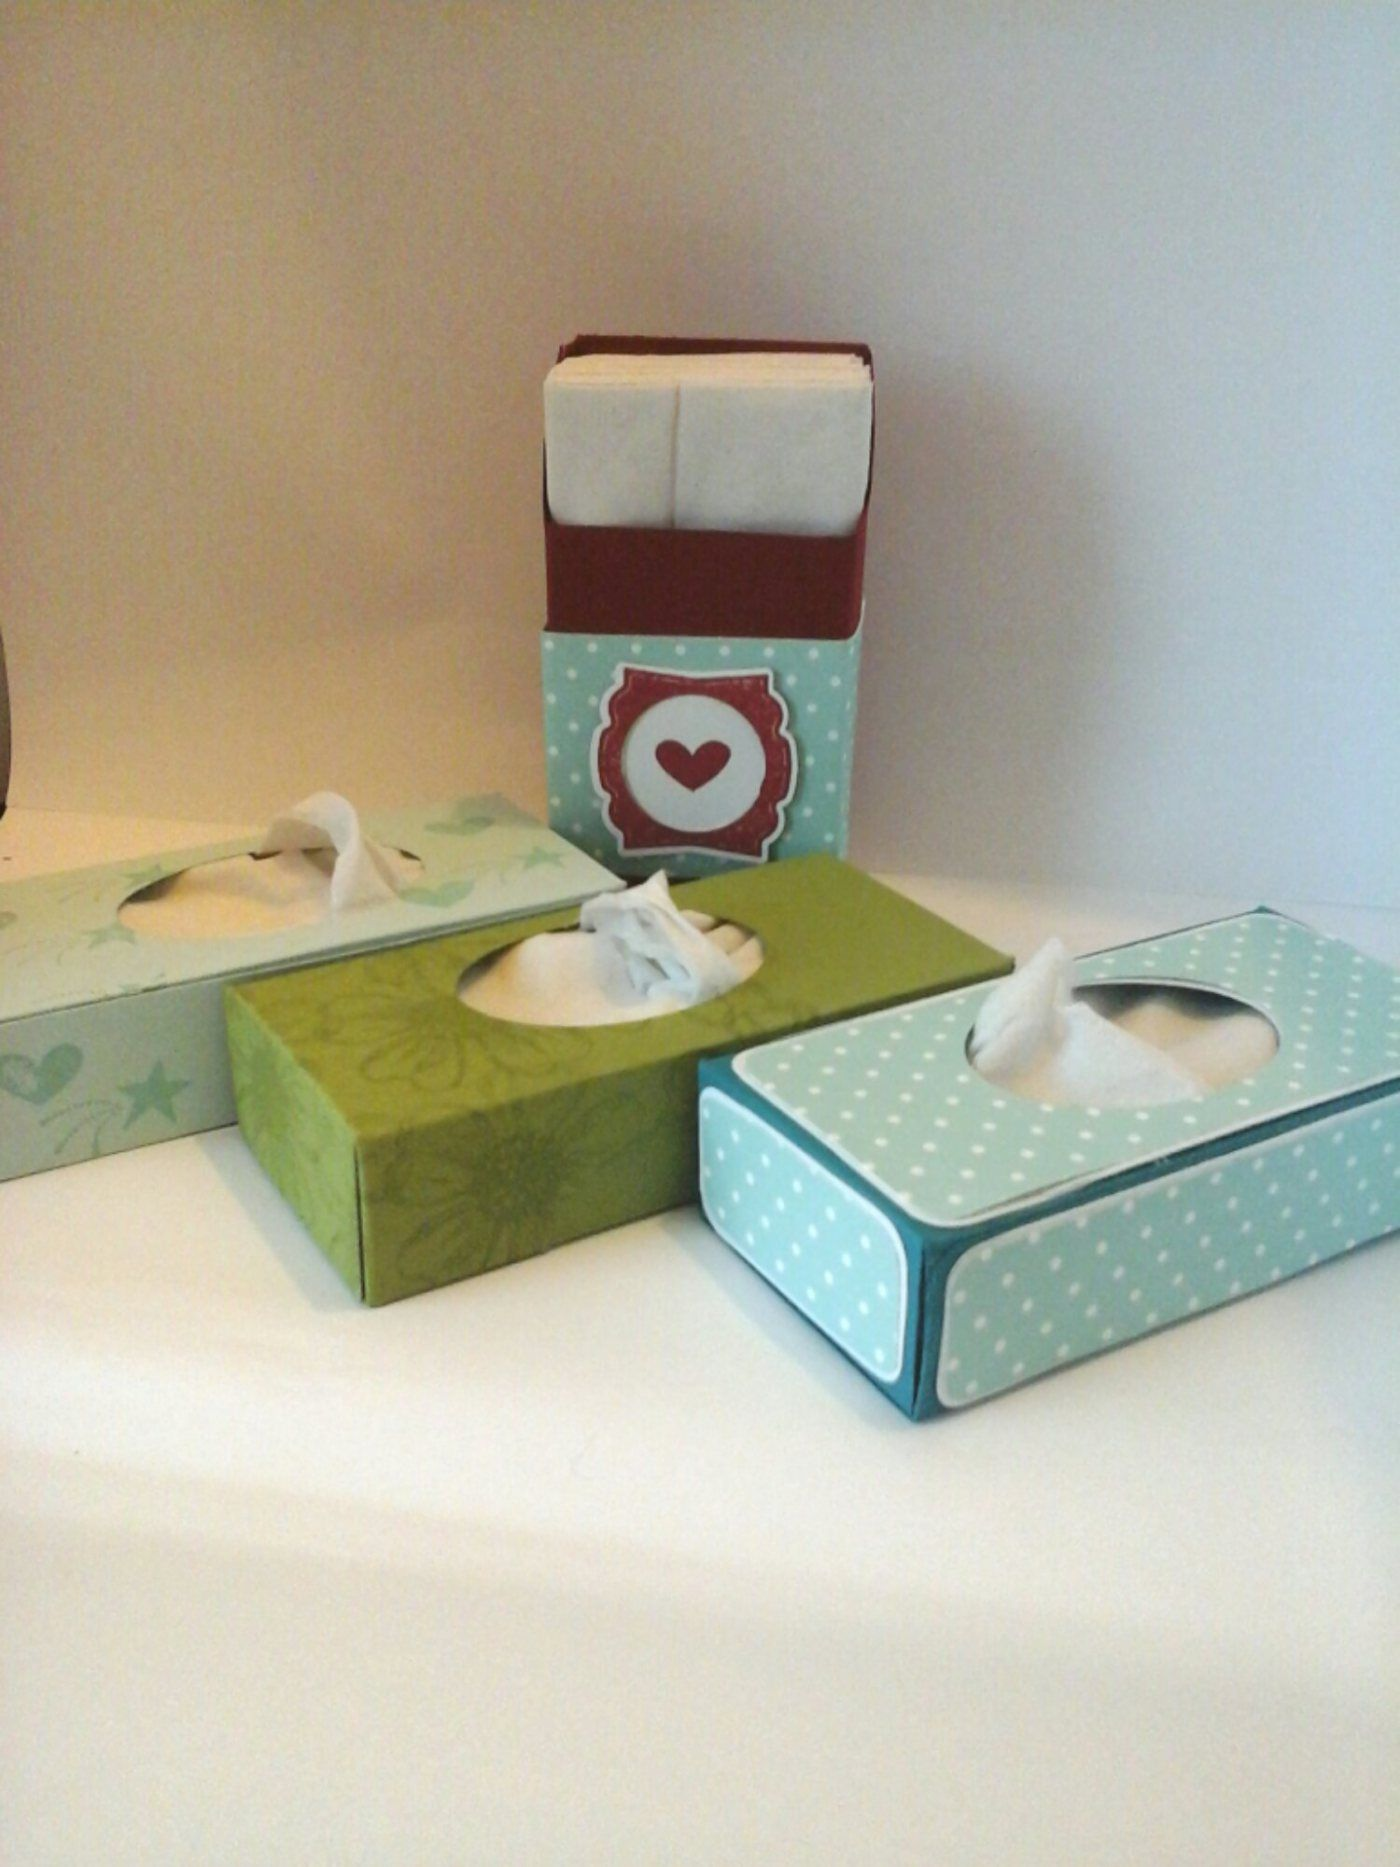 Pocket tissue boxes